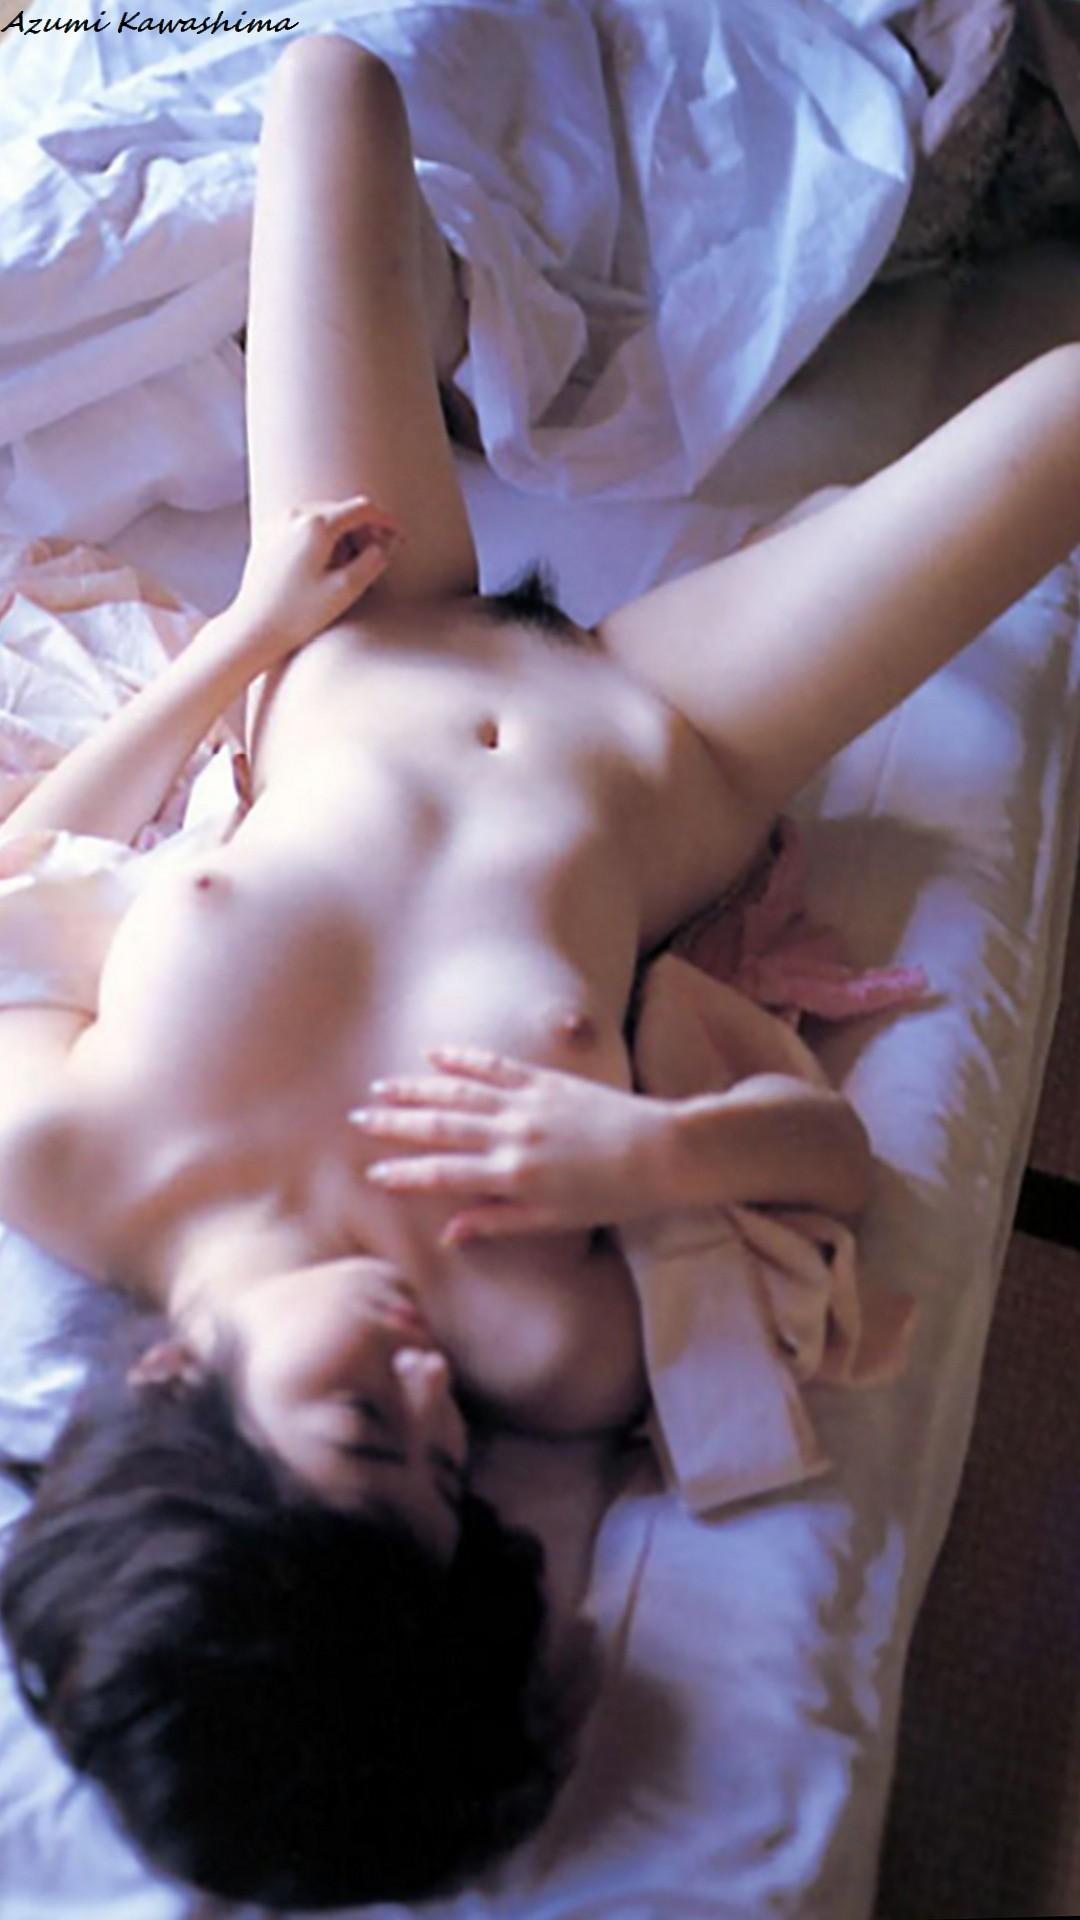 azumi kawashima  photobook nude